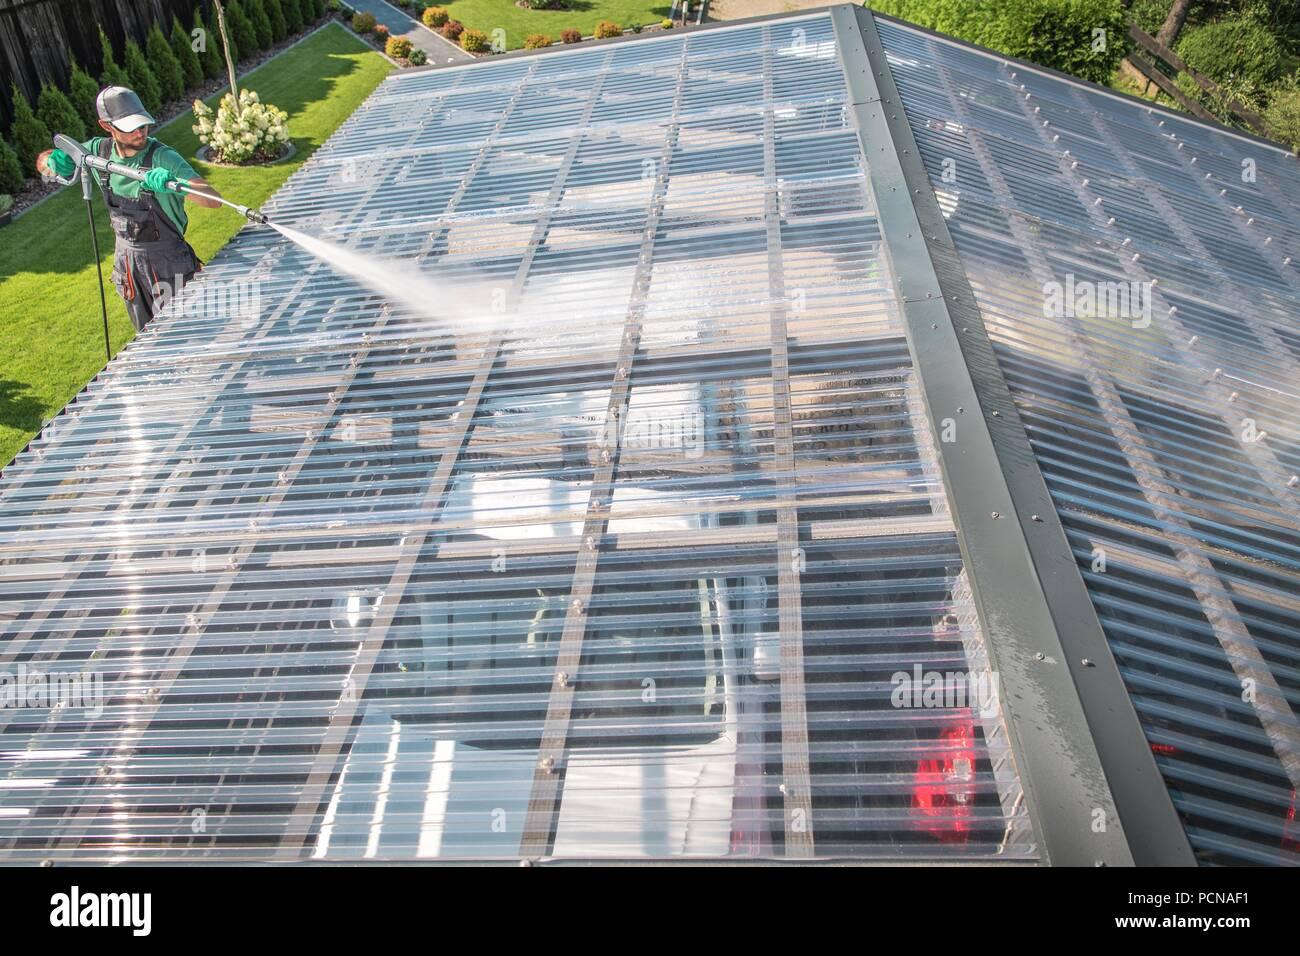 Caucasian Men in His 30s Cleaning Transparent Carport Garage Roof Using Pressure Washer. - Stock Image